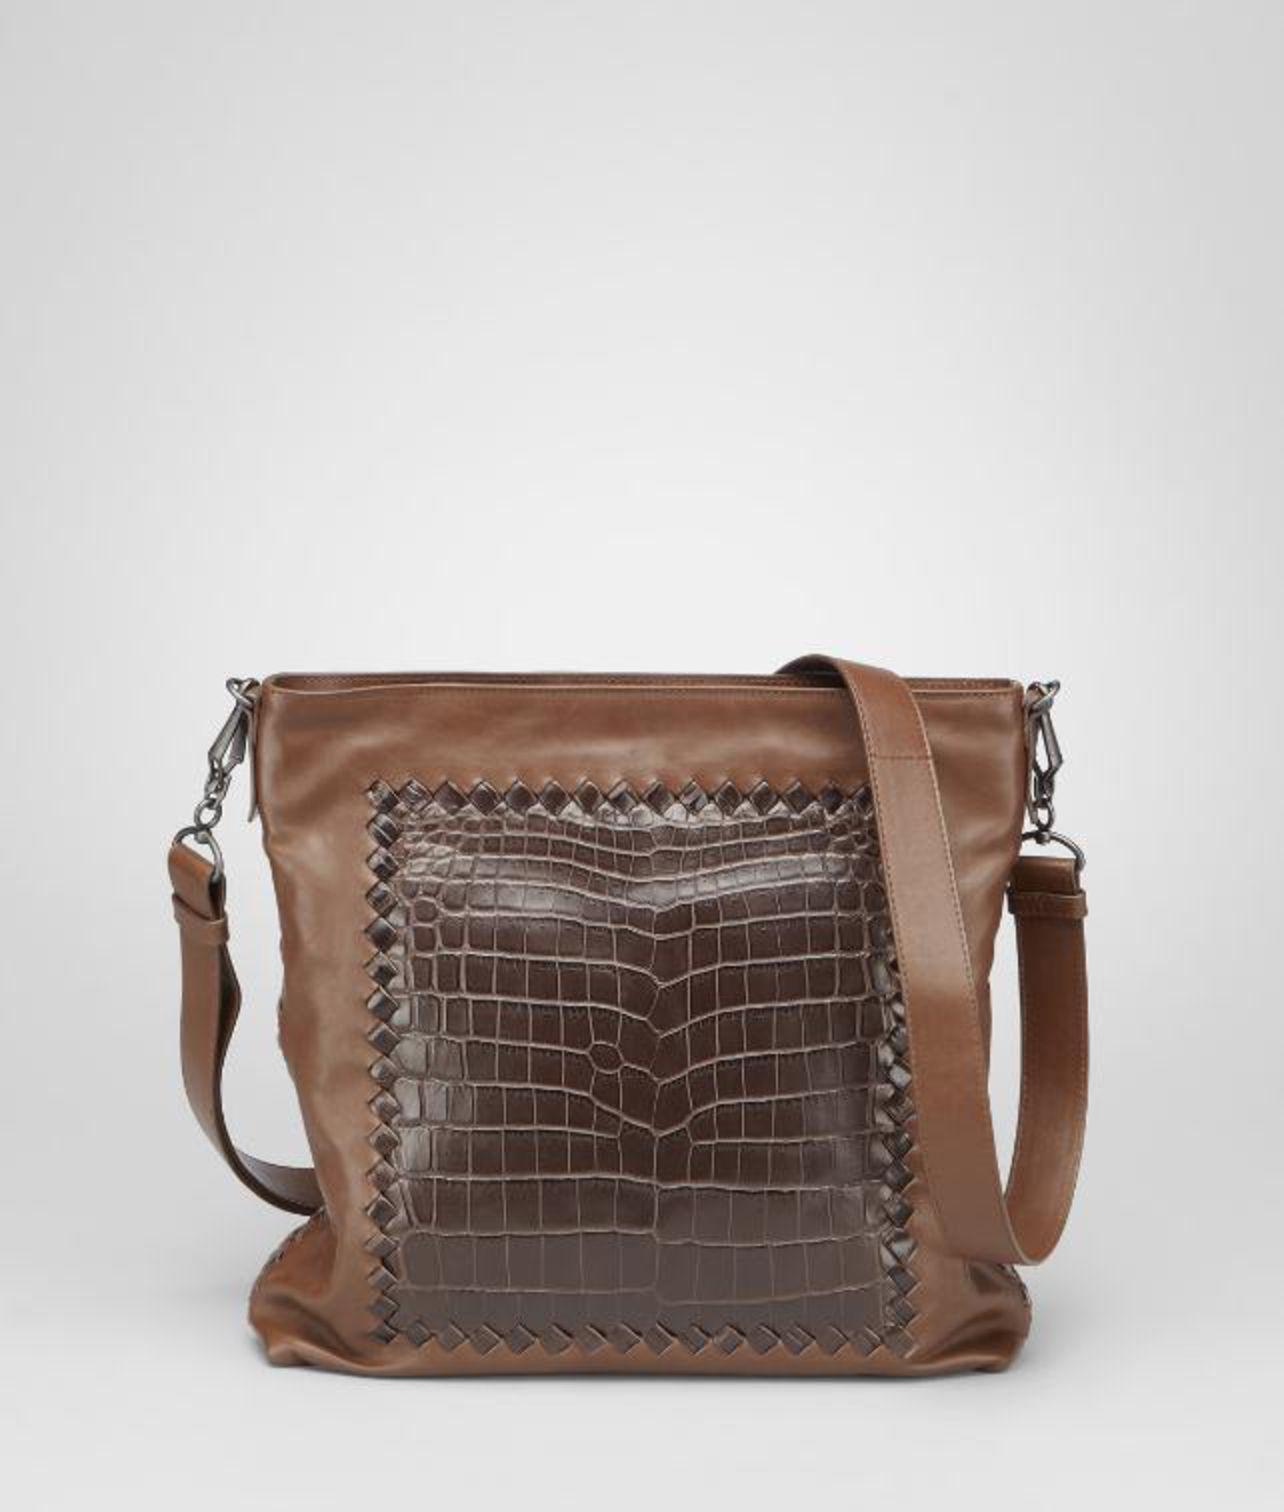 7742178a047e Bottega Veneta Light Calf Soft Crocodile Fume Cross Body Bag in ...